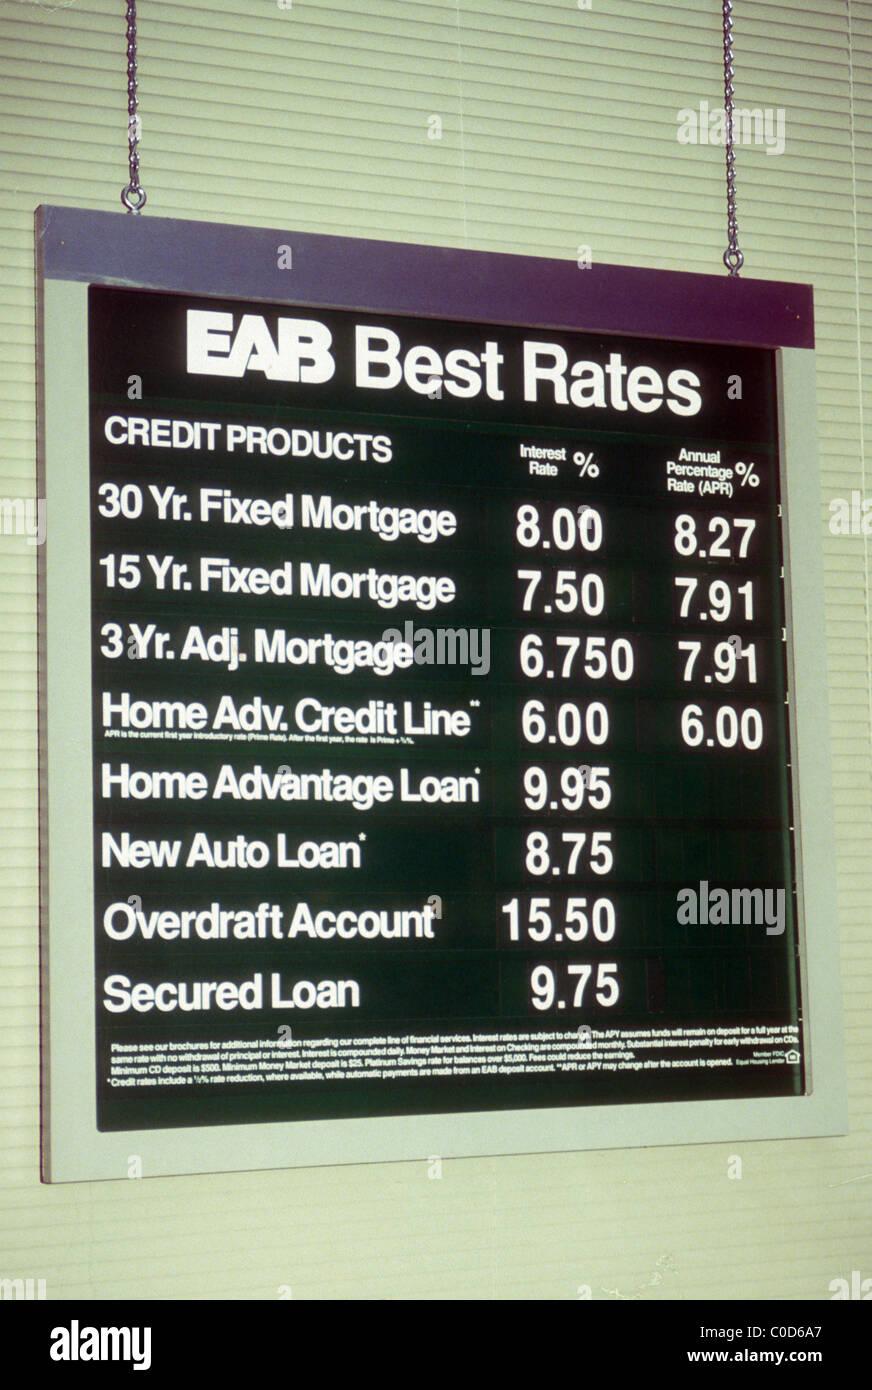 European American Bank Eab Loan Interest Rates Seen In New York In